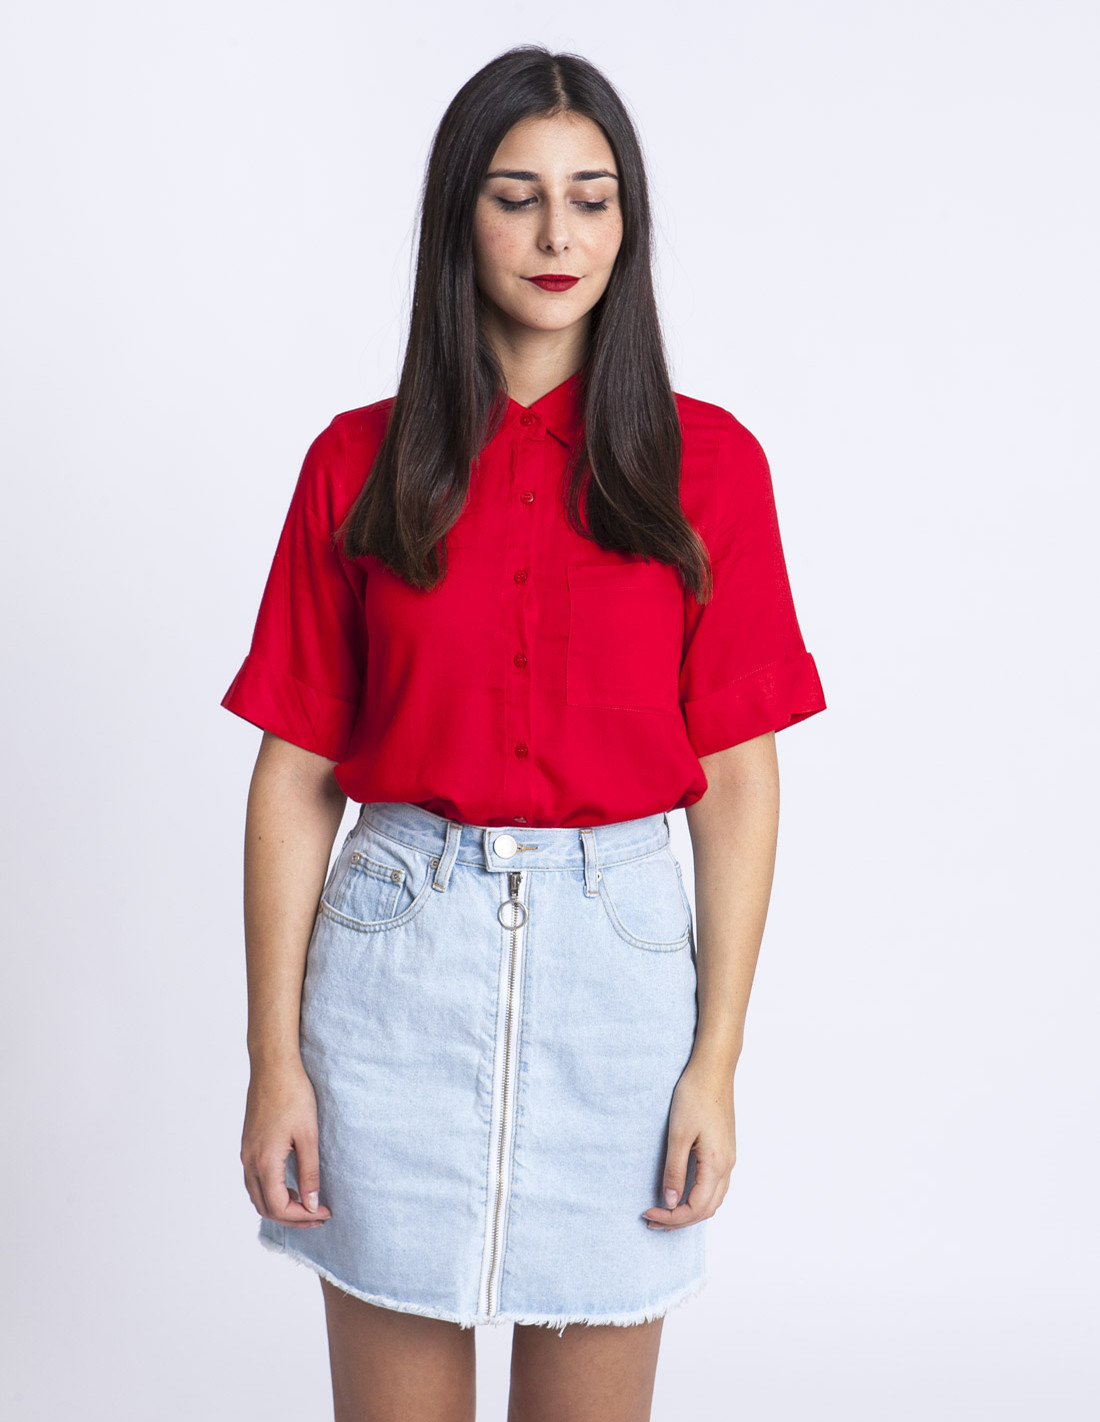 Camisa roja flores Compañia Fantástica